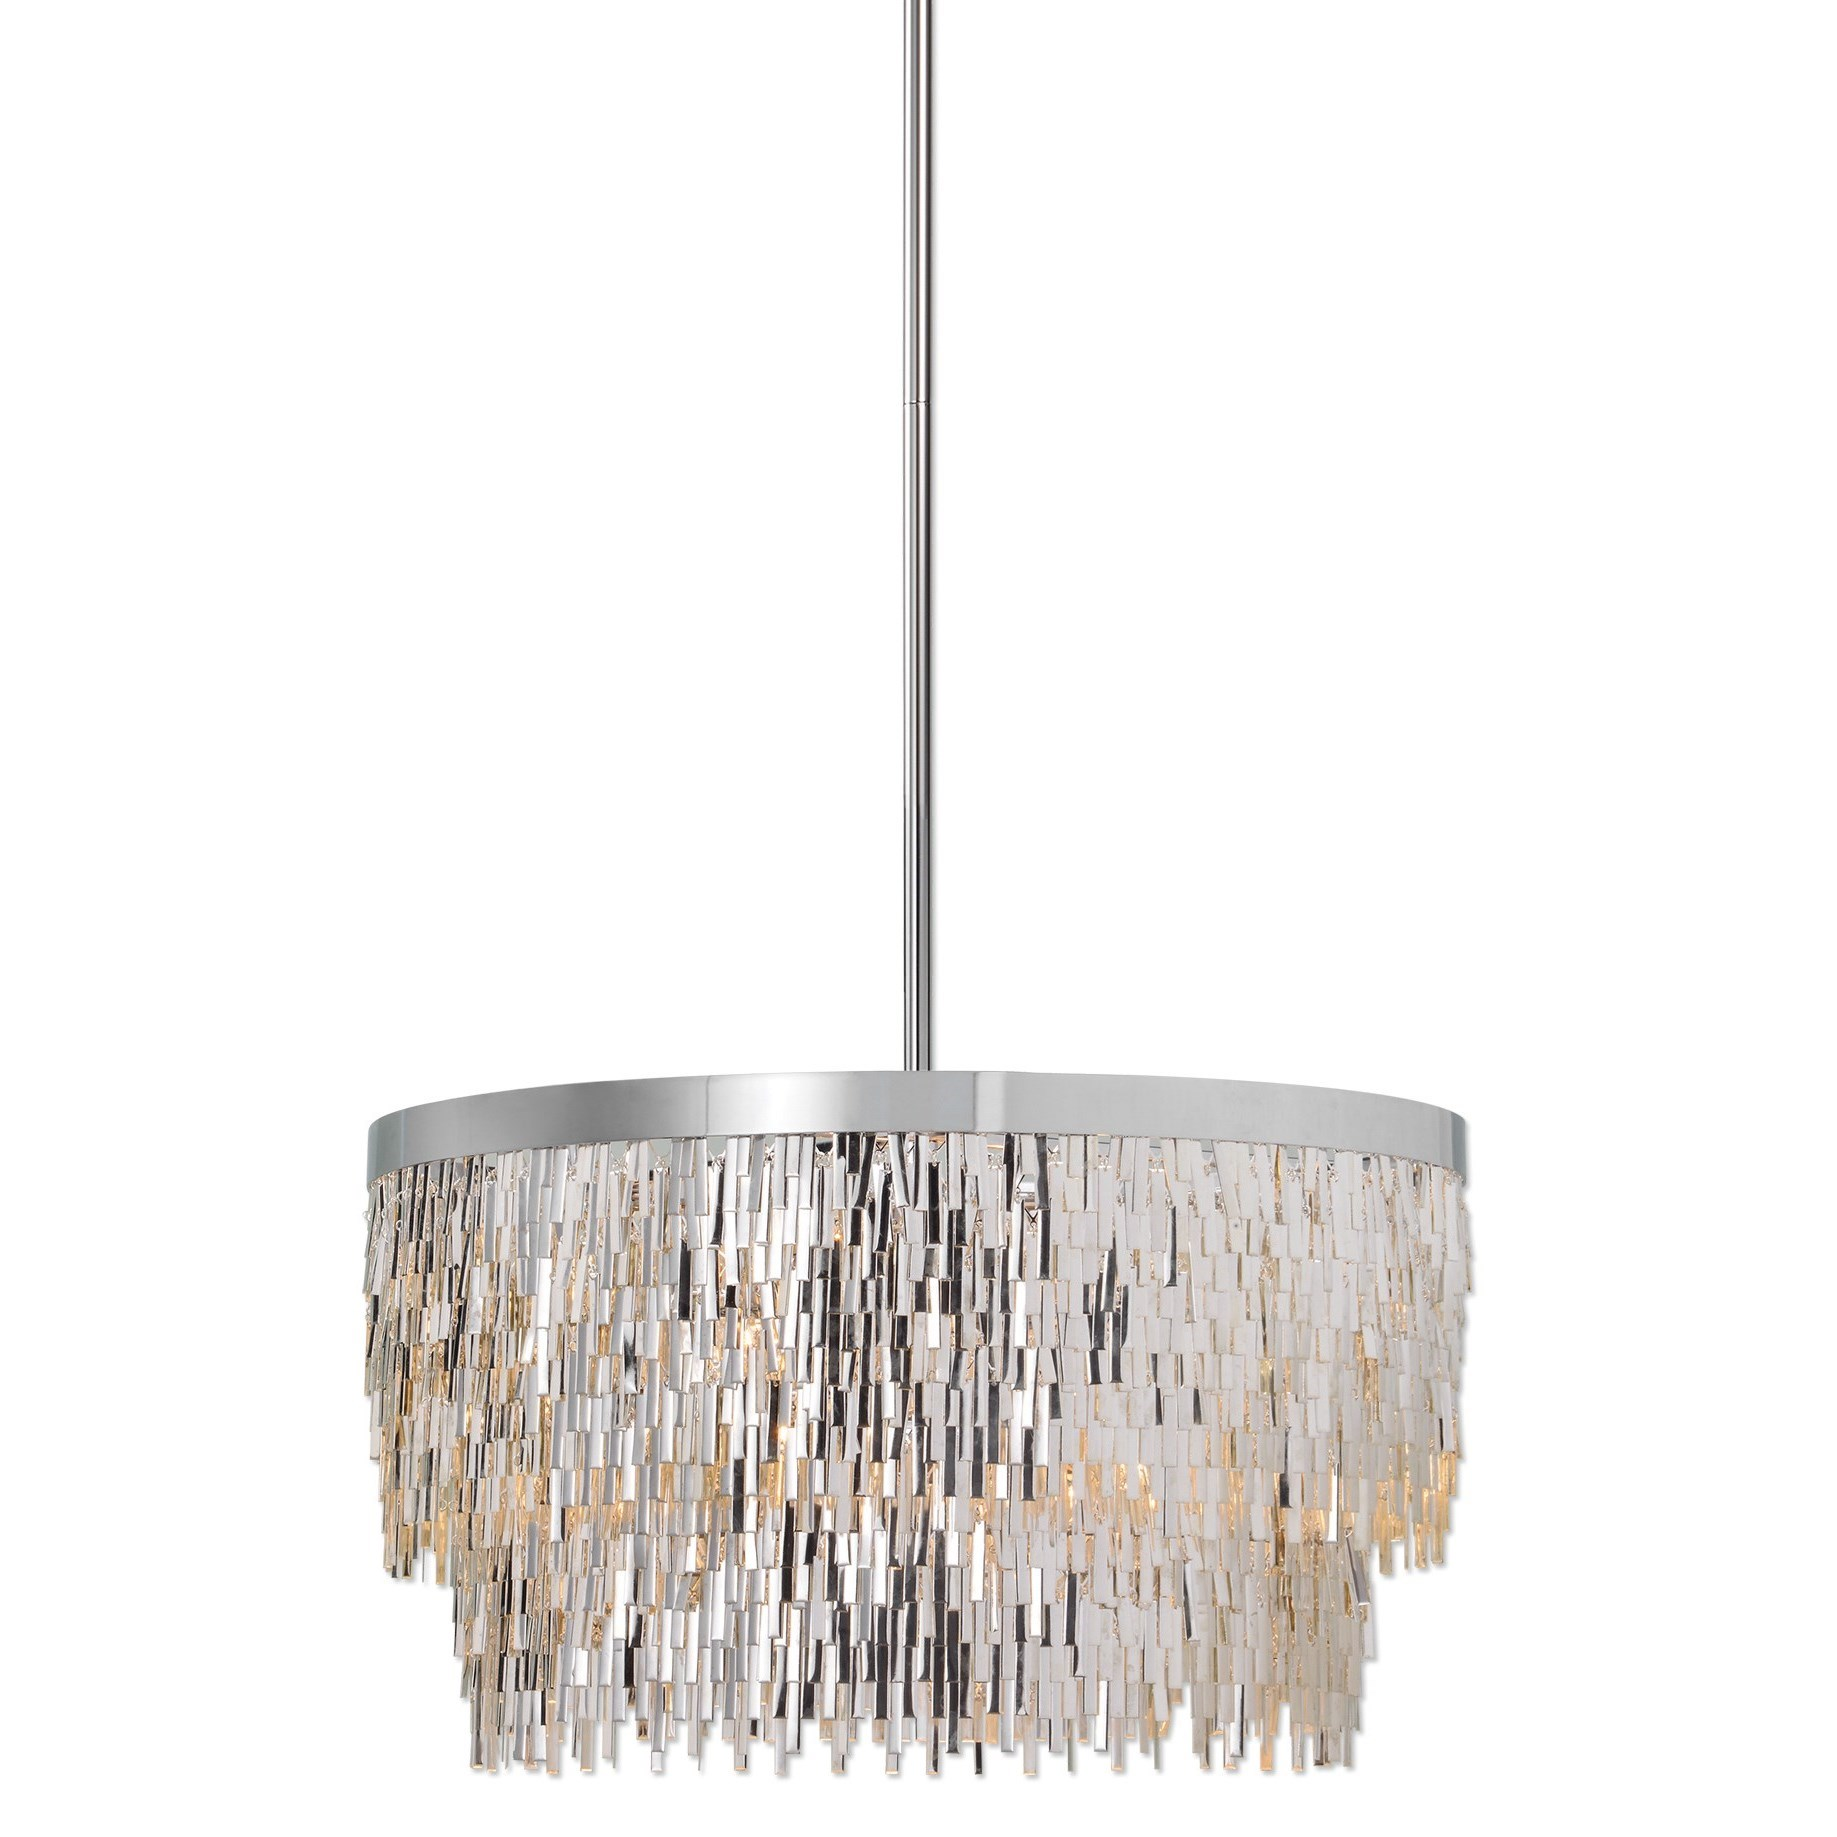 Uttermost Lighting Fixtures Millie 6 Light Chrome Pendant - Item Number: 21283